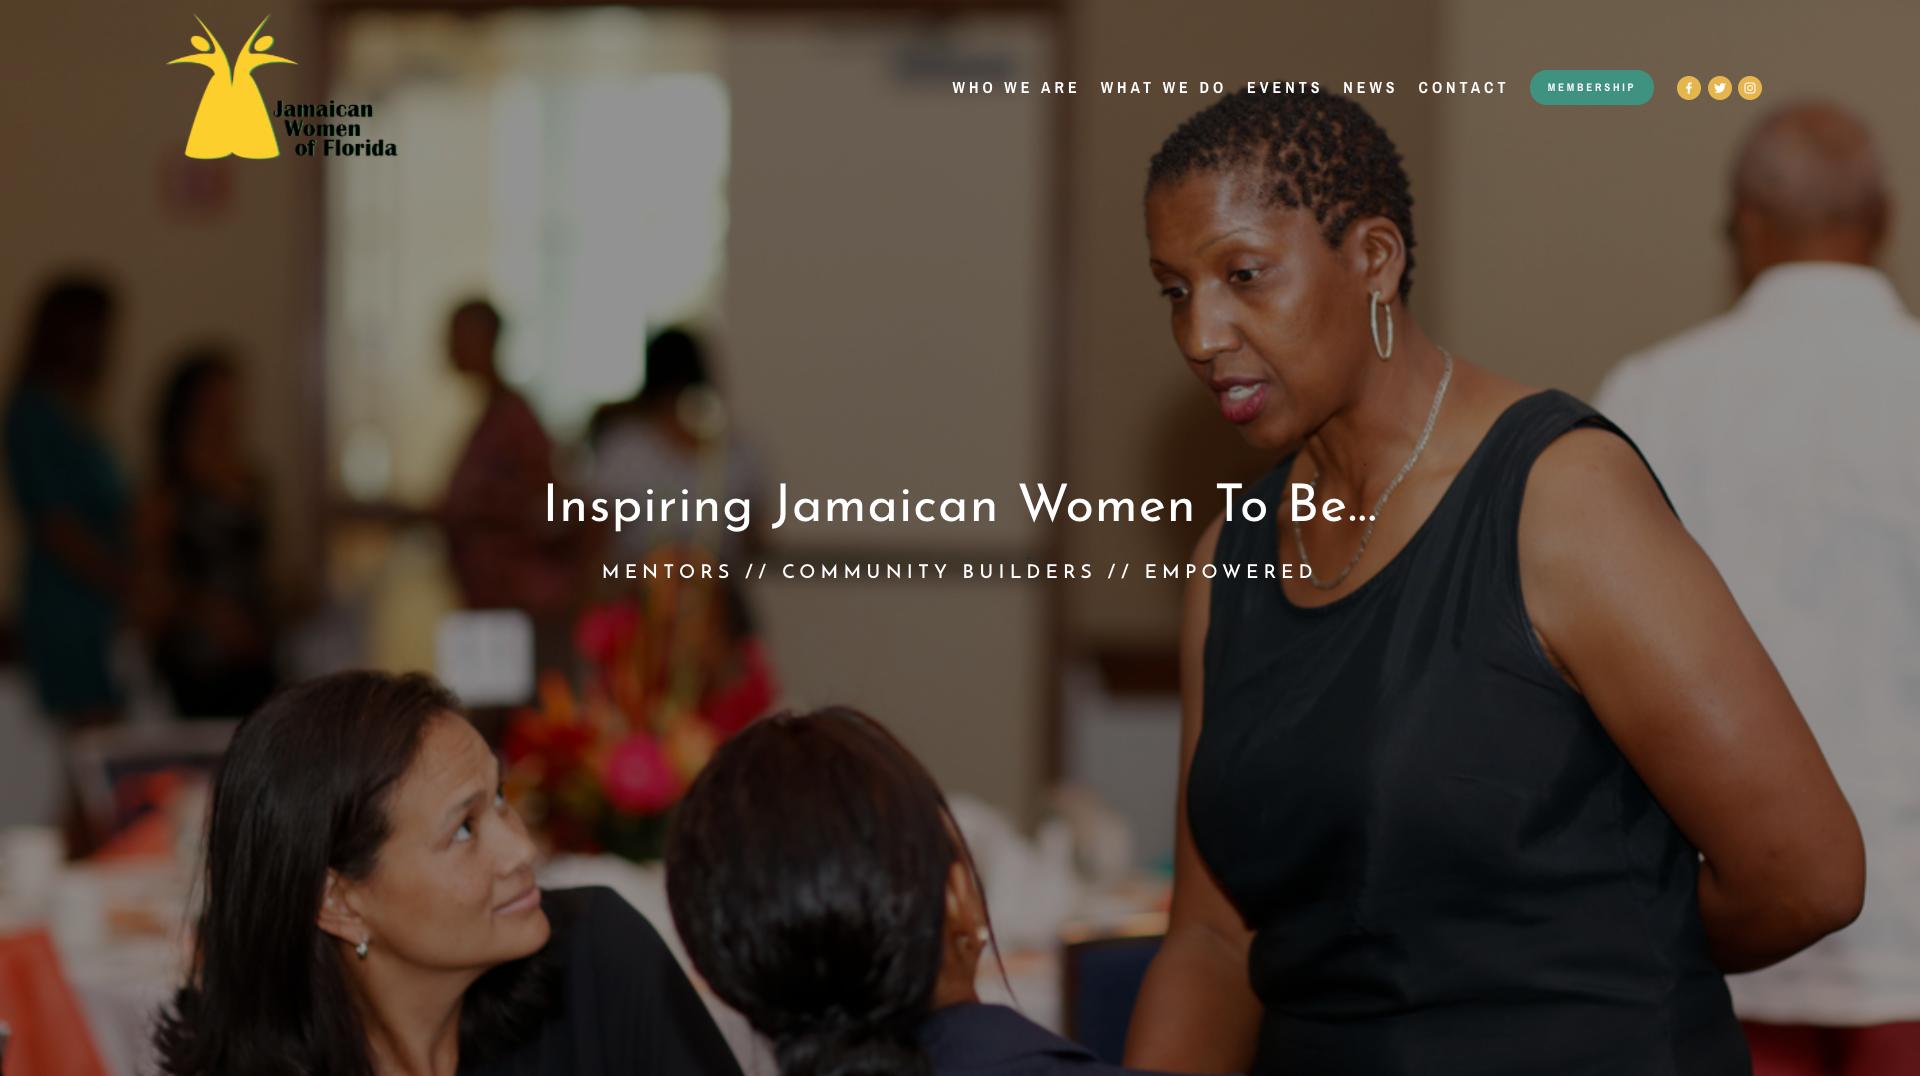 JAMAICAN WOMEN OF FLORIDA